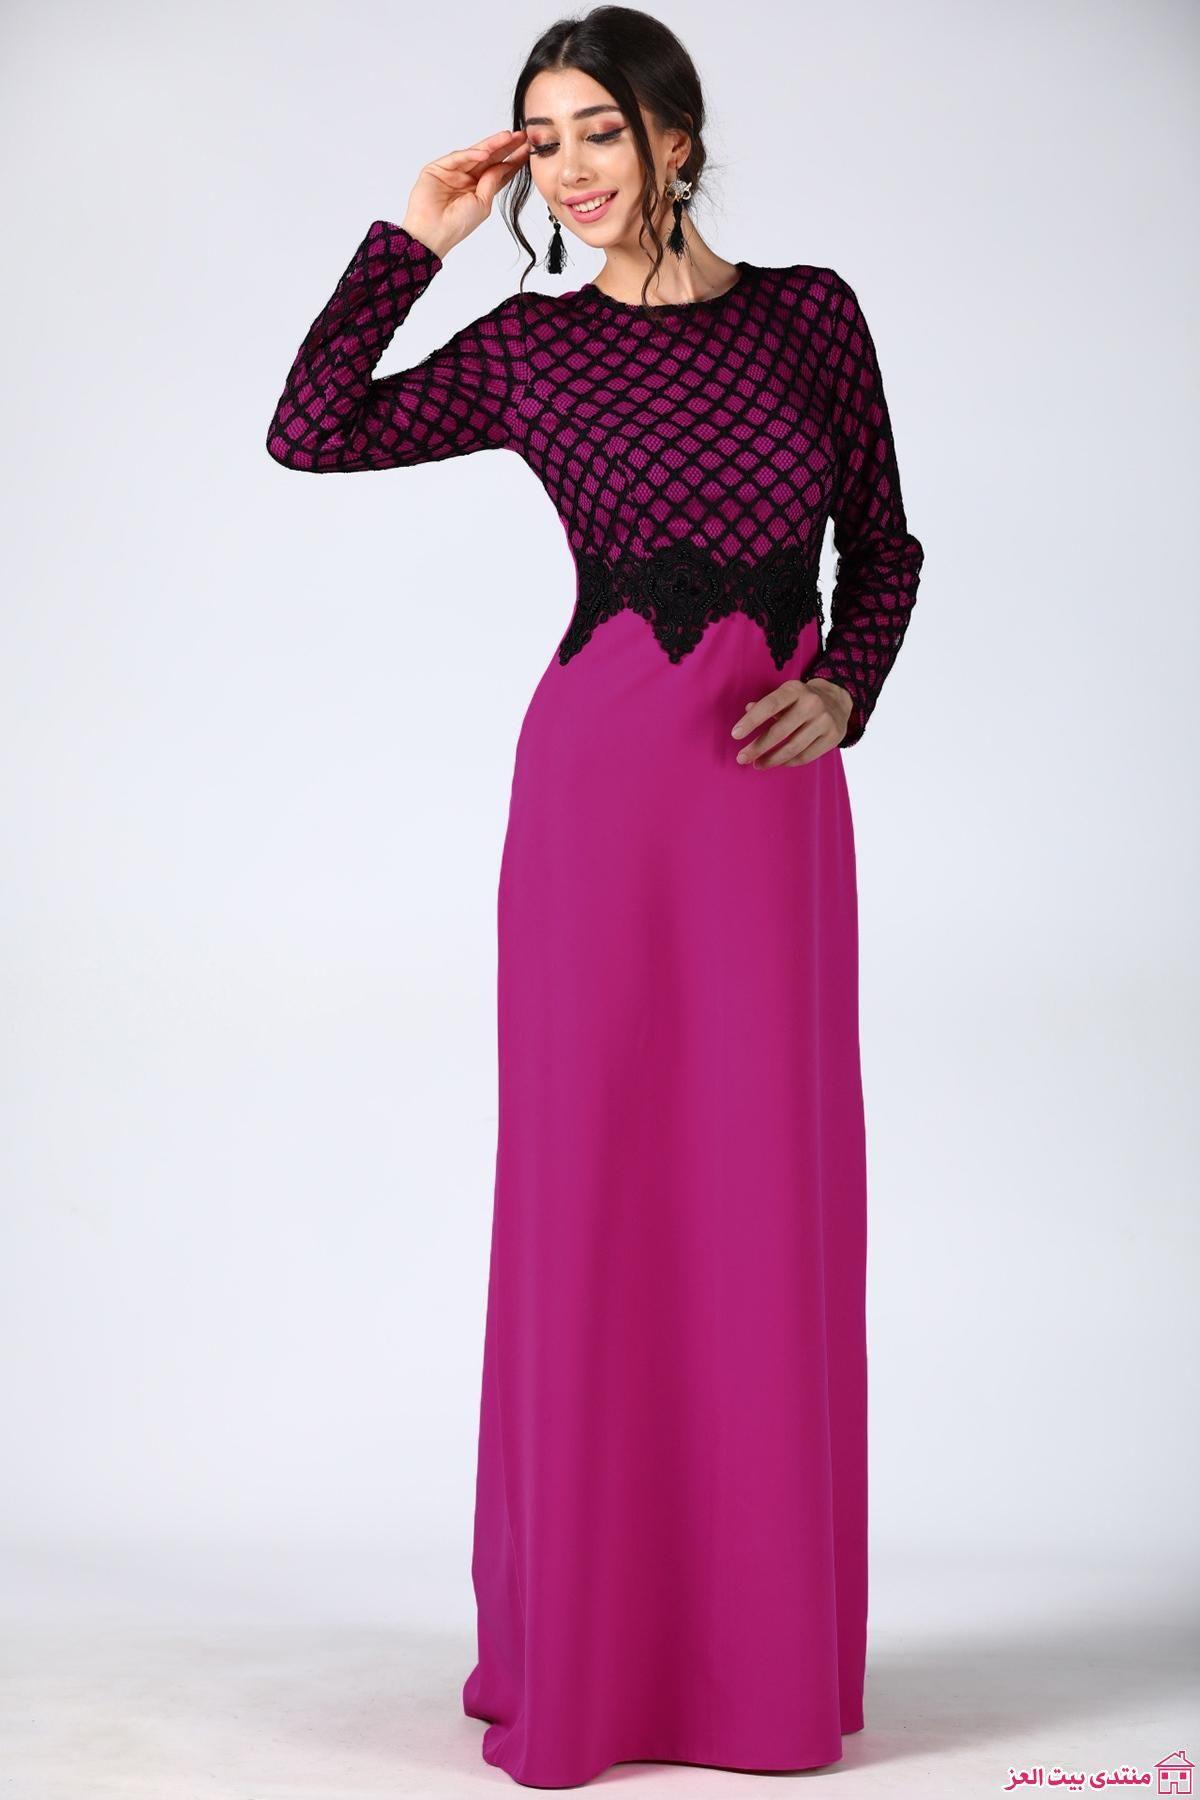 df0d604e8 فساتين طويلة فساتين سهرة طويلة   فاشون وموضه   High neck dress ...